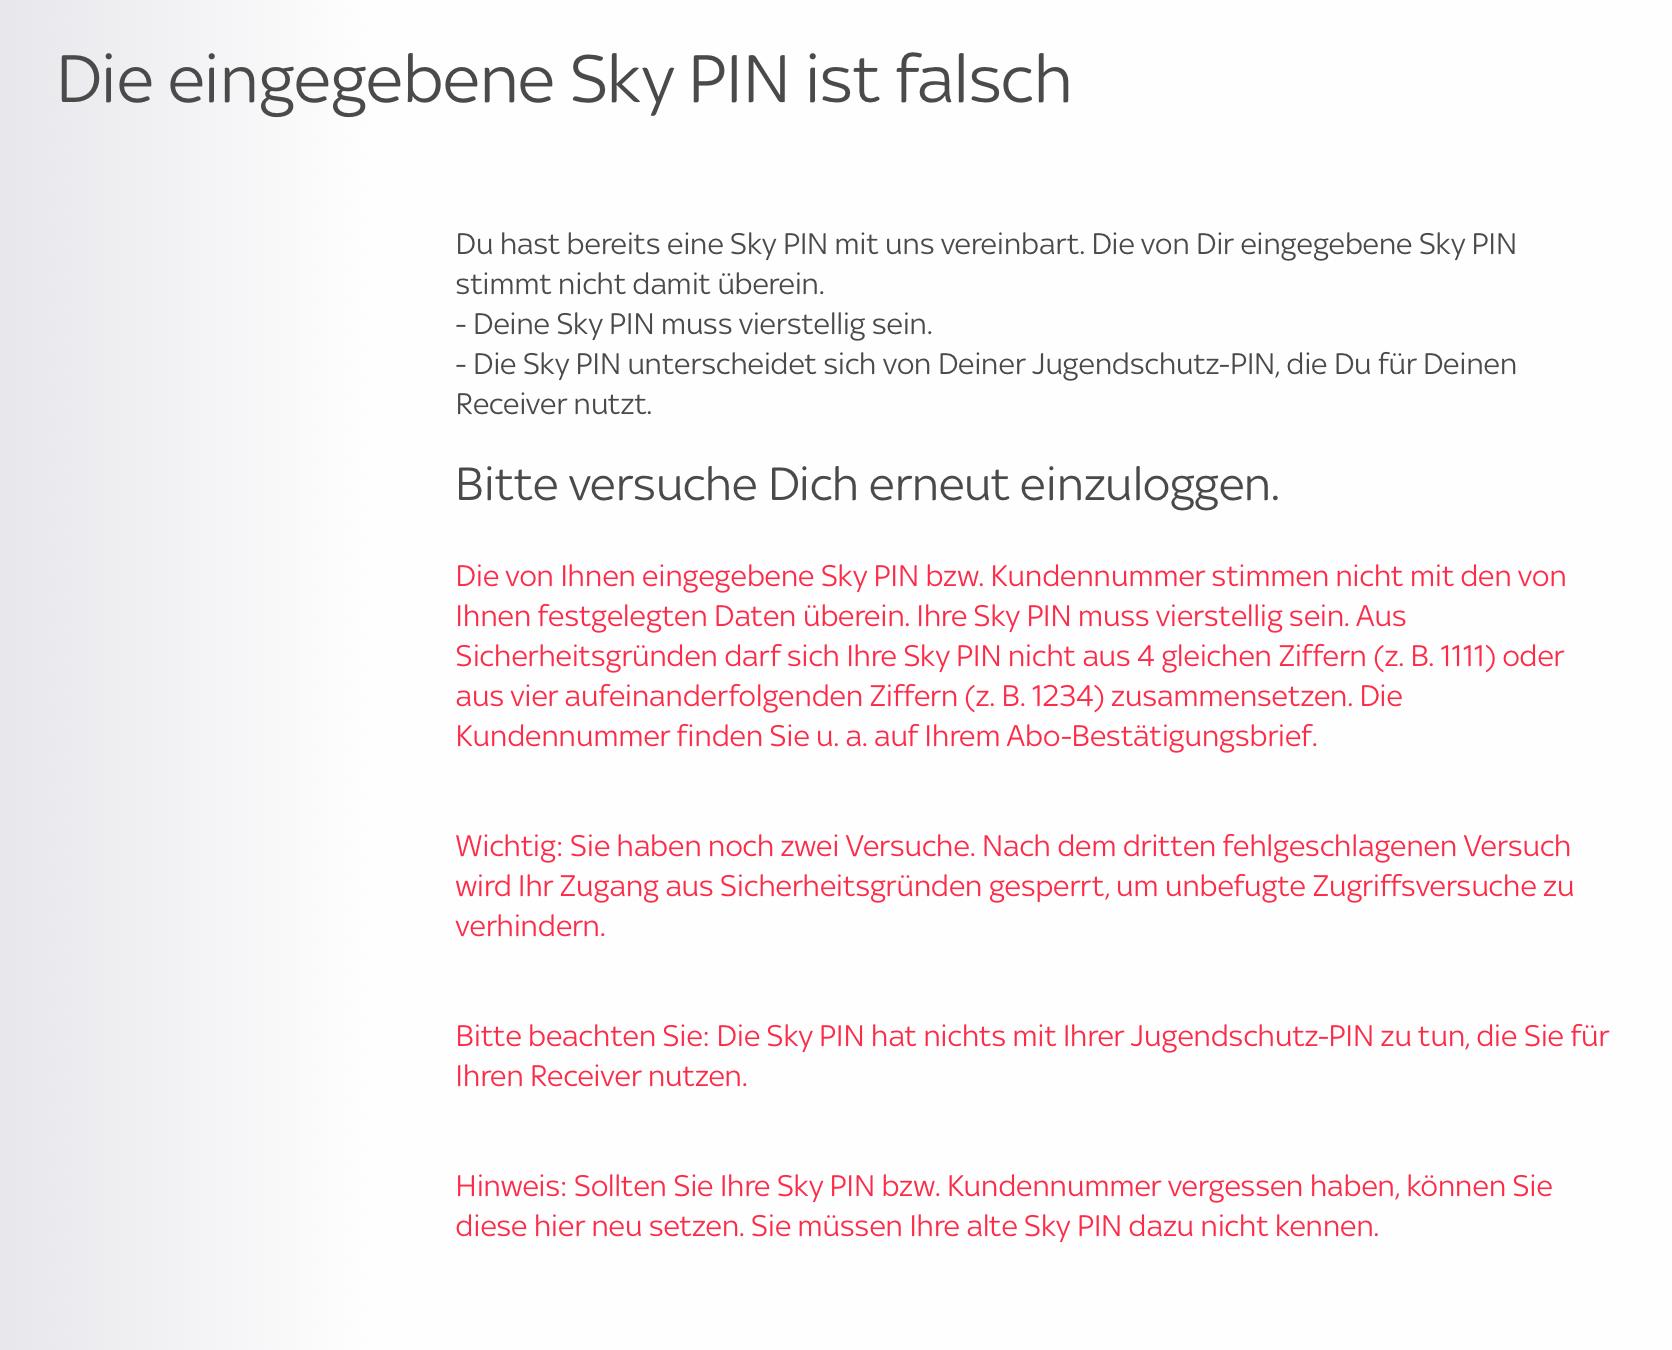 Sky 18 Pin Freischalten Online